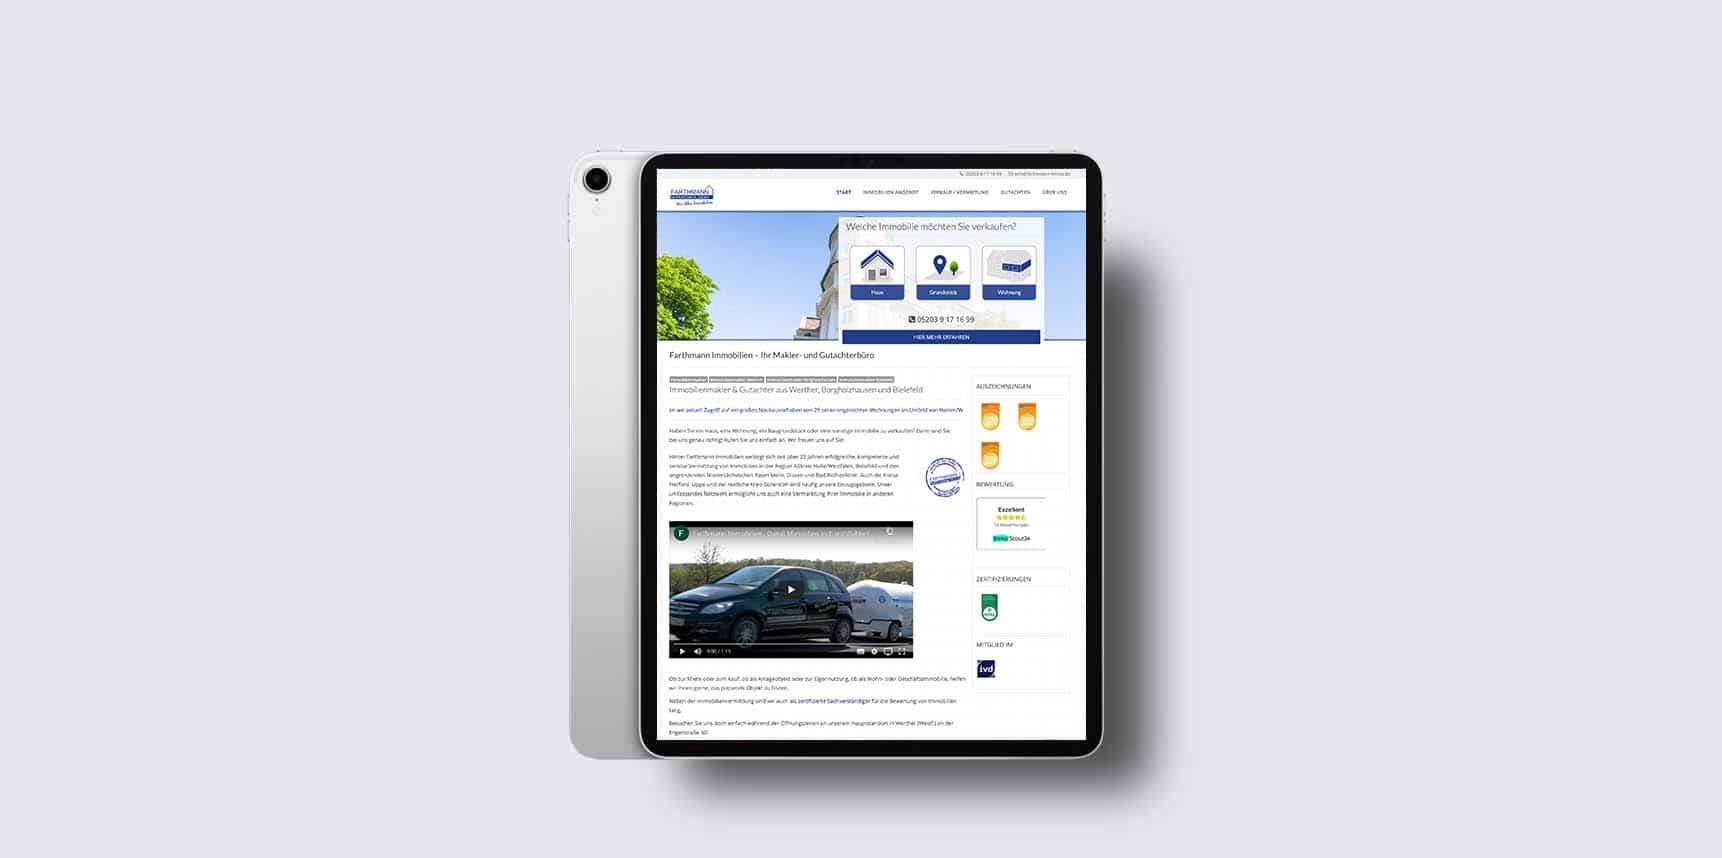 iPad Pro Mockup von Farthmann Immobilien